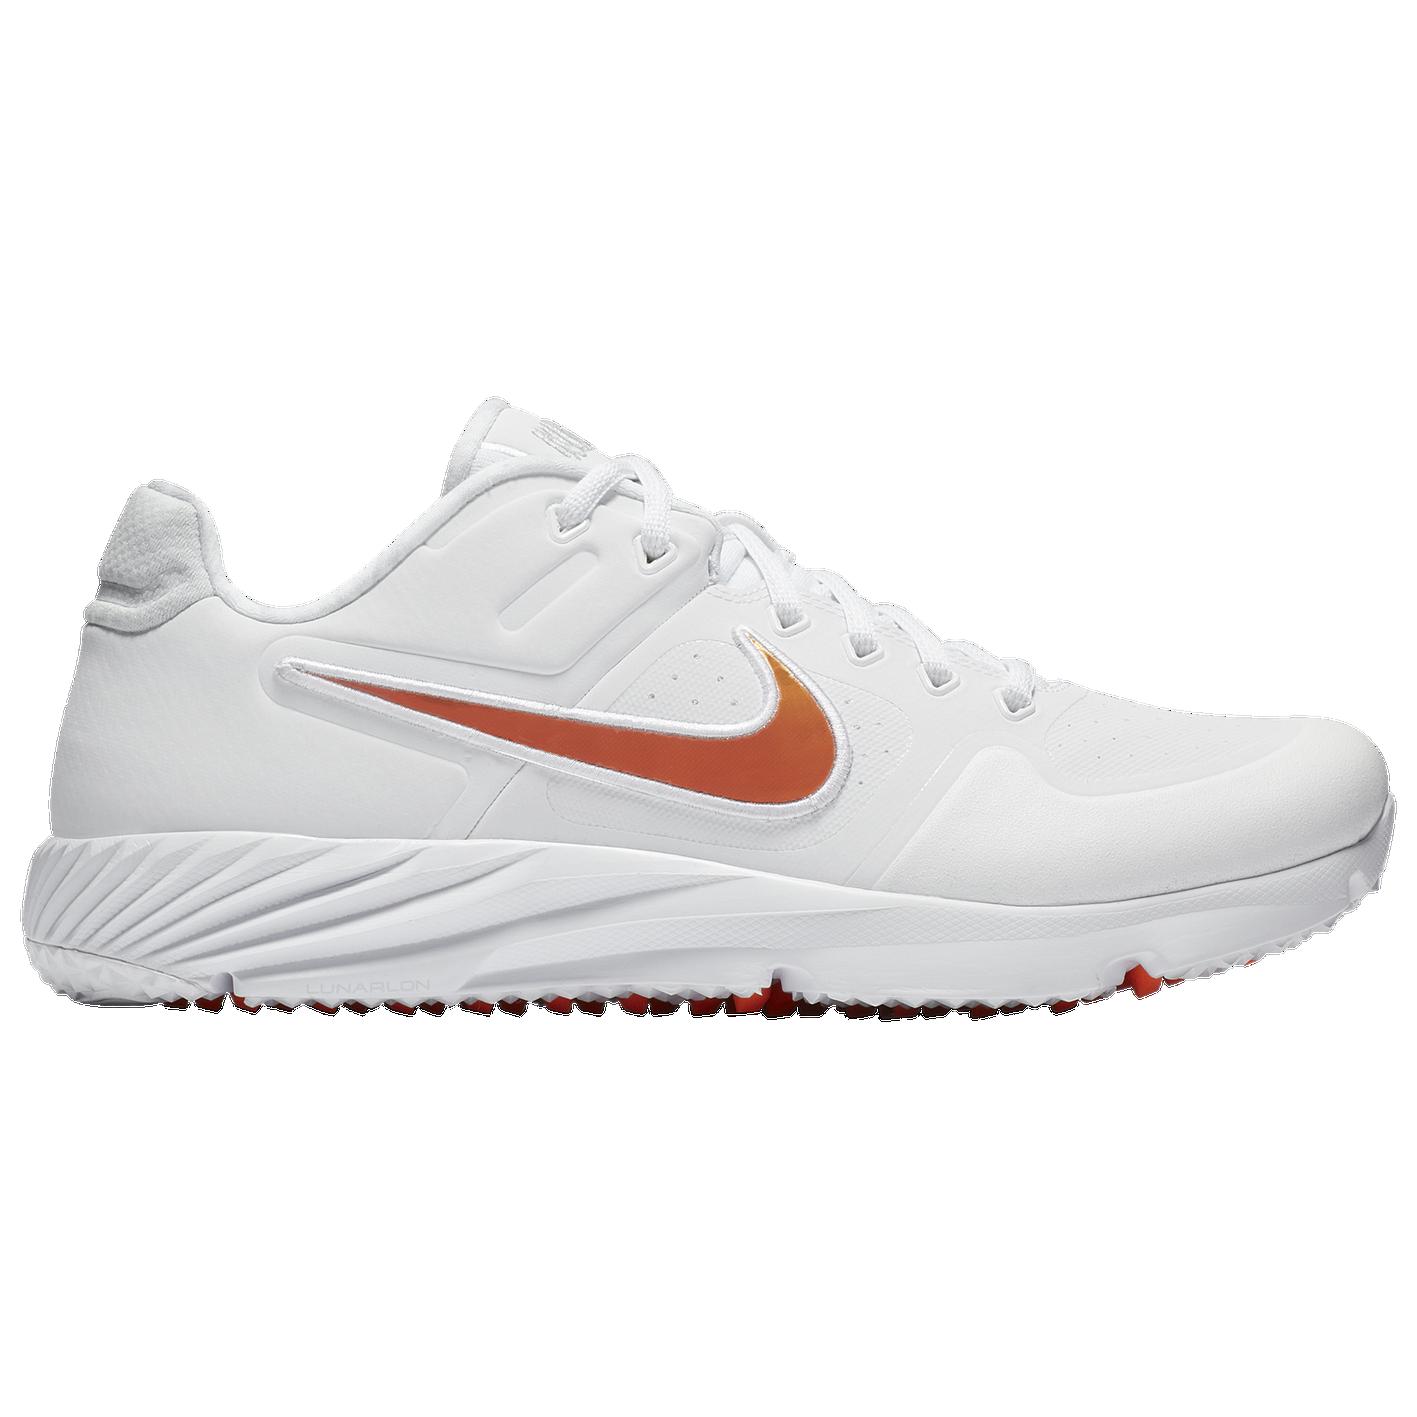 da436a379 Nike Alpha Huarache Elite 2 Turf - Men s - Baseball - Shoes - White ...